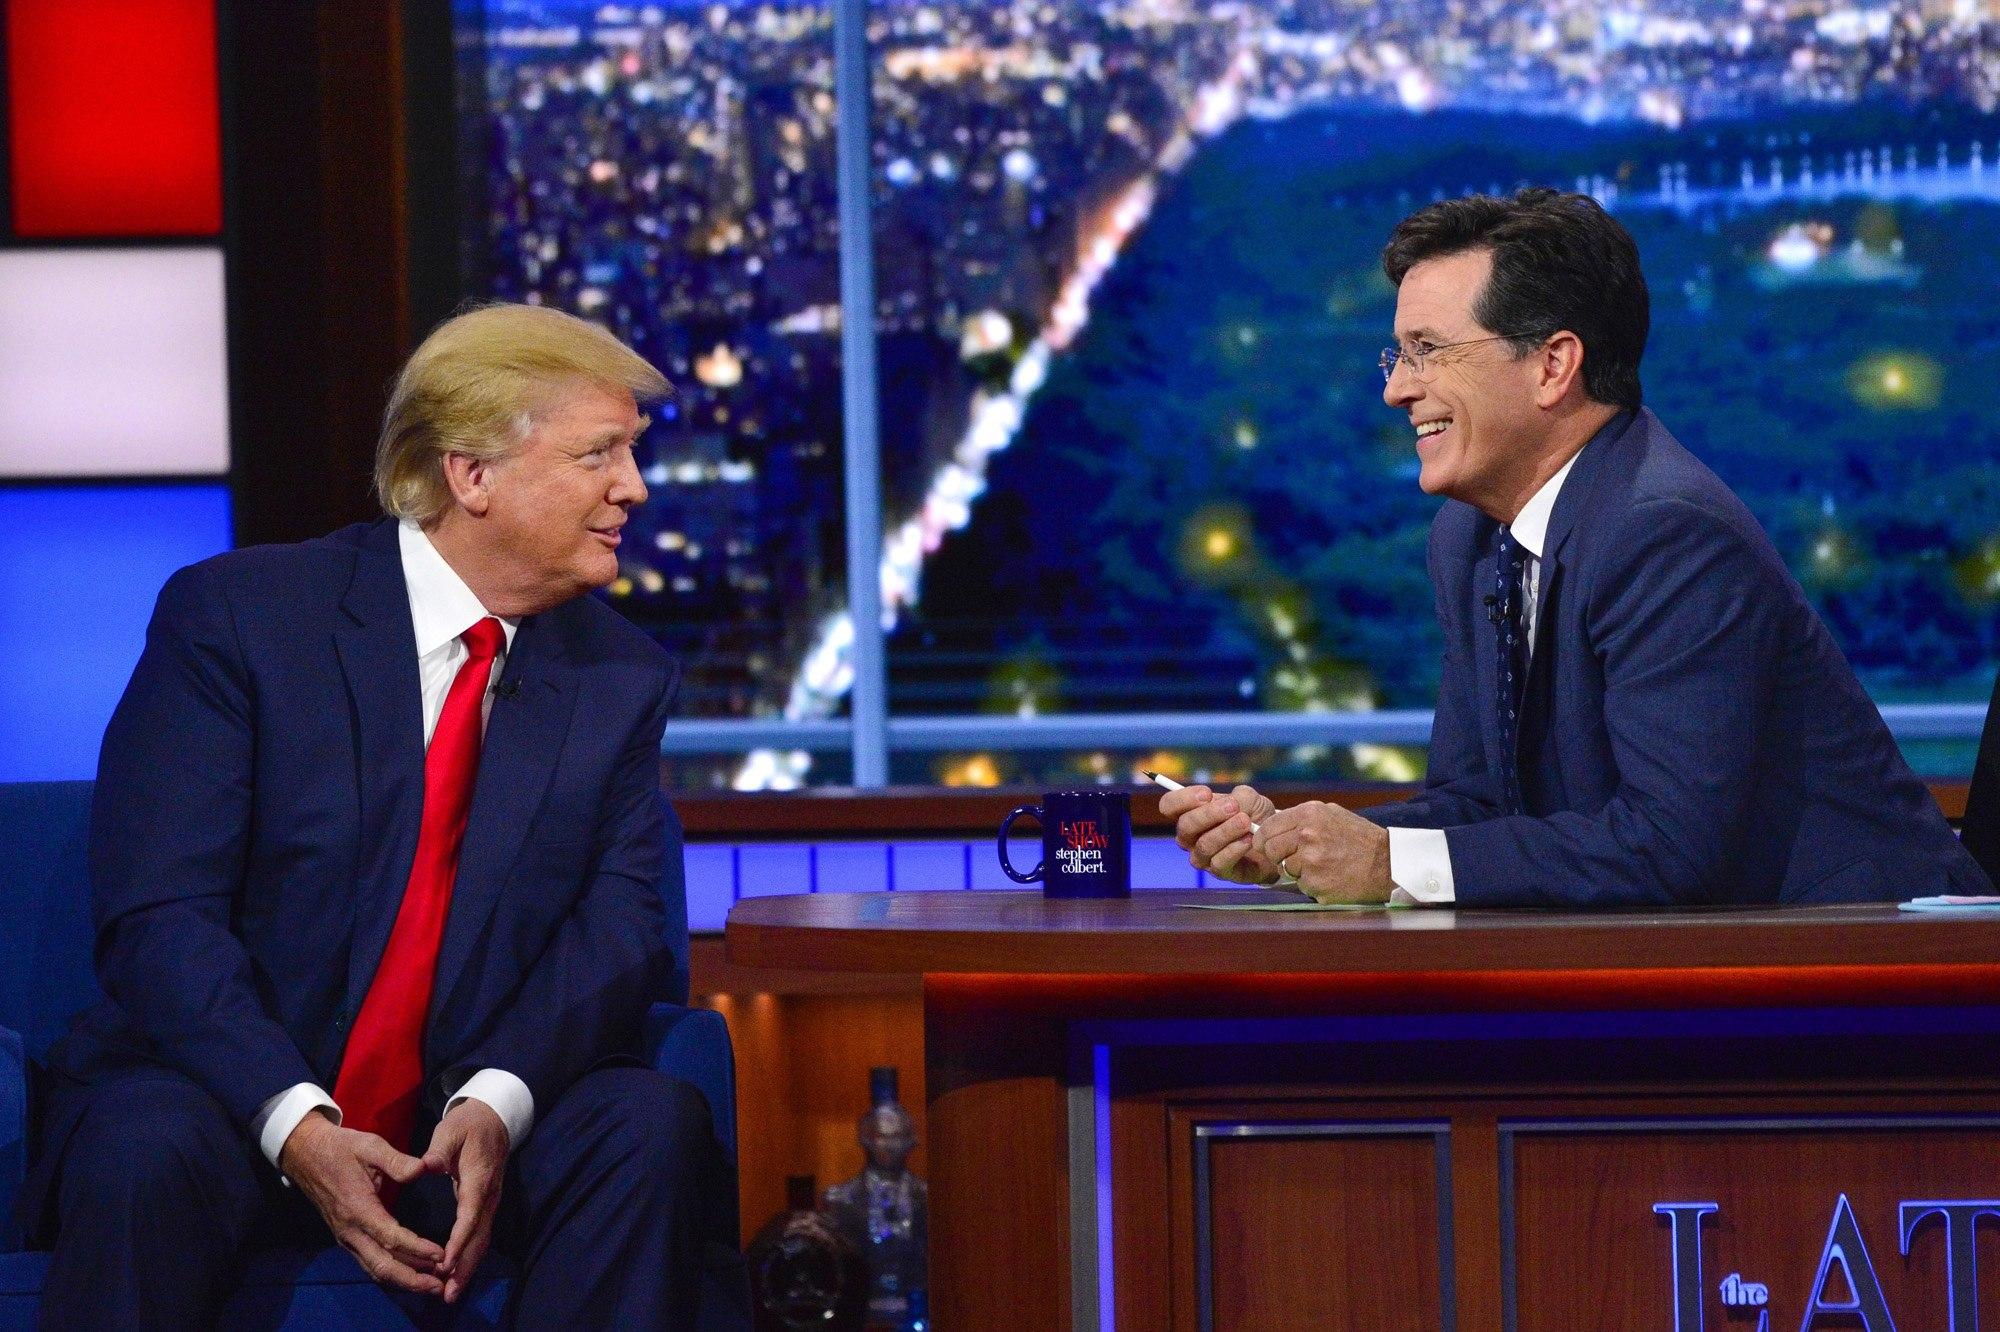 Donald Trump talking to Stephen Colbert